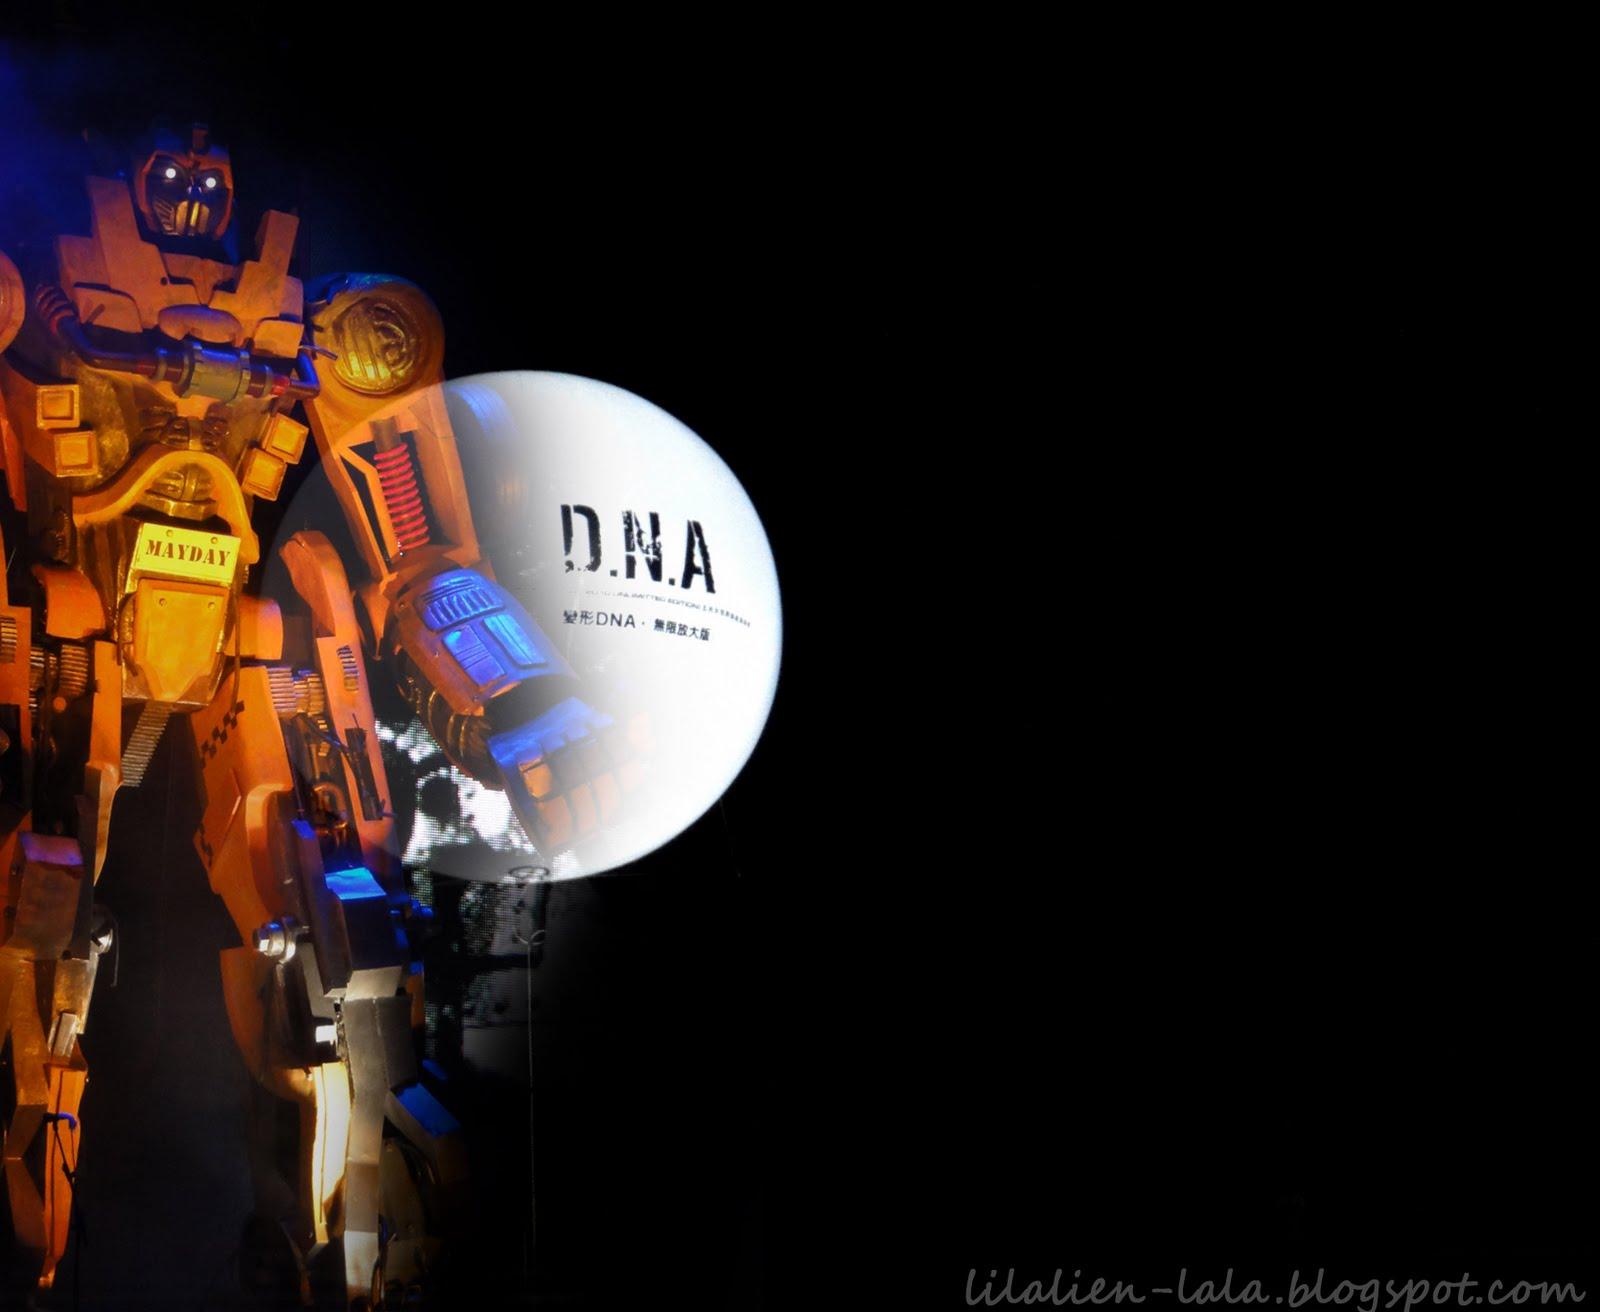 http://2.bp.blogspot.com/_dq6_CaZBACQ/S8tlfQQ3SPI/AAAAAAAAGvc/AgrwKWlrbIE/s1600/Wallpaper+Robot+Mayday+DNA+Unlimited+2010+Concert+Singapore+copy+copy.jpg